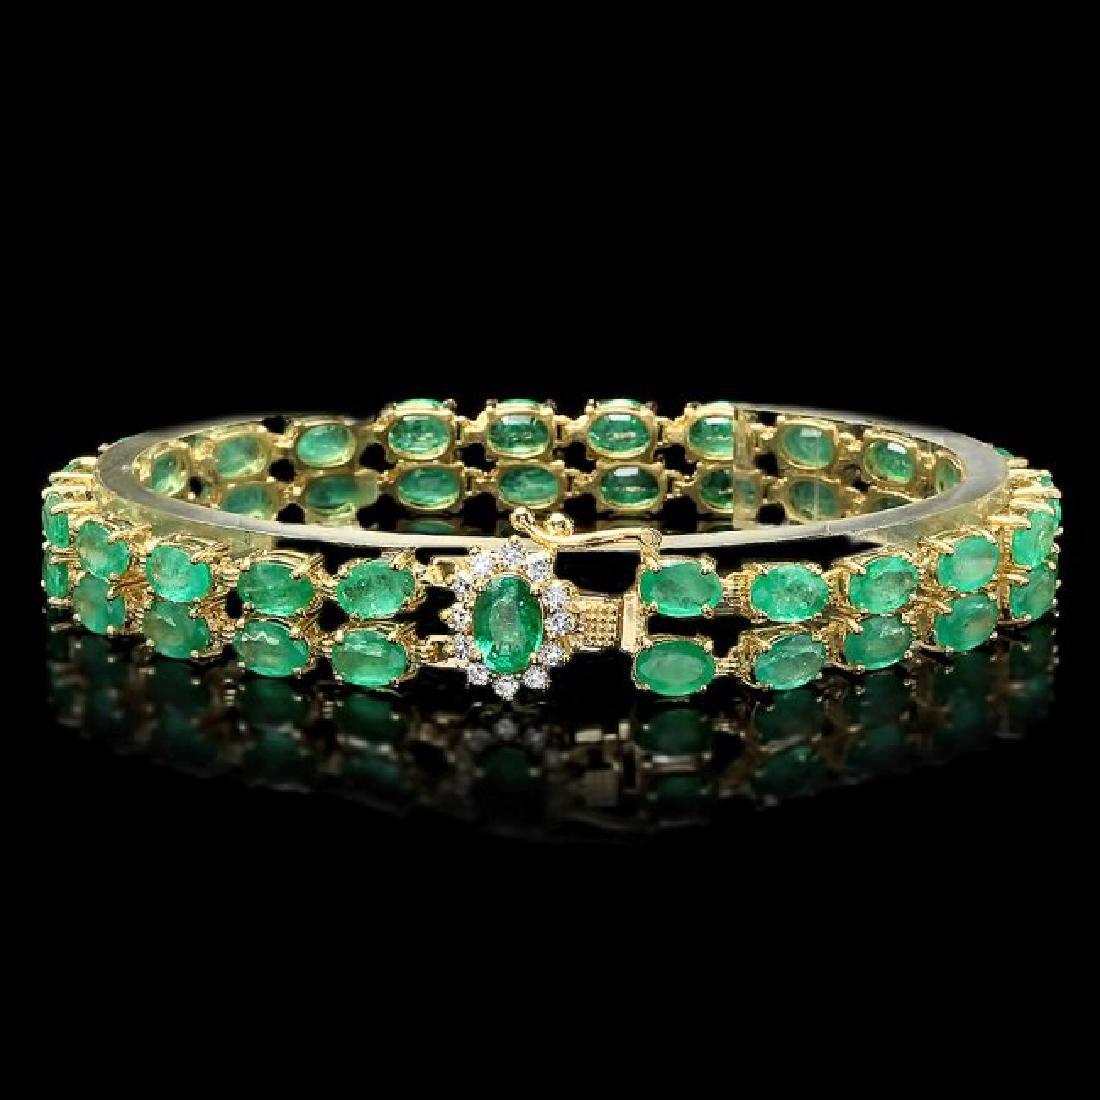 14k Gold 18ct Emerald 0.40ct Diamond Bracelet - 2